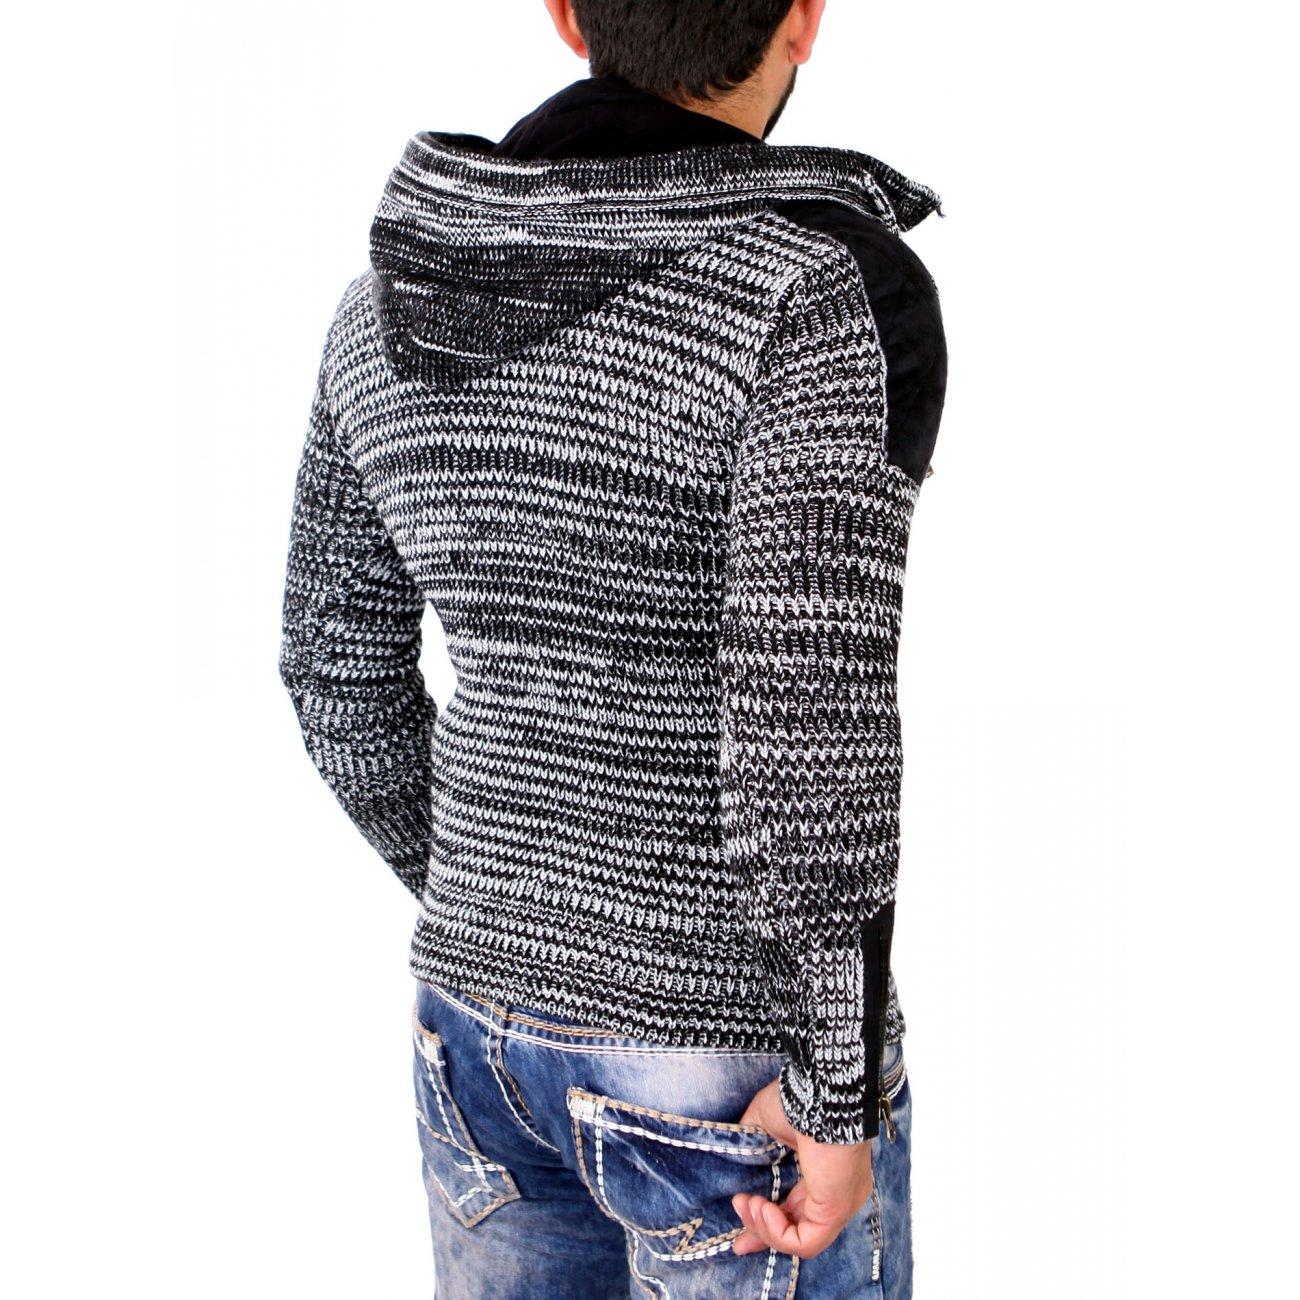 tazzio pullover herren winter grobstrick kapuzen pulli tz 454. Black Bedroom Furniture Sets. Home Design Ideas